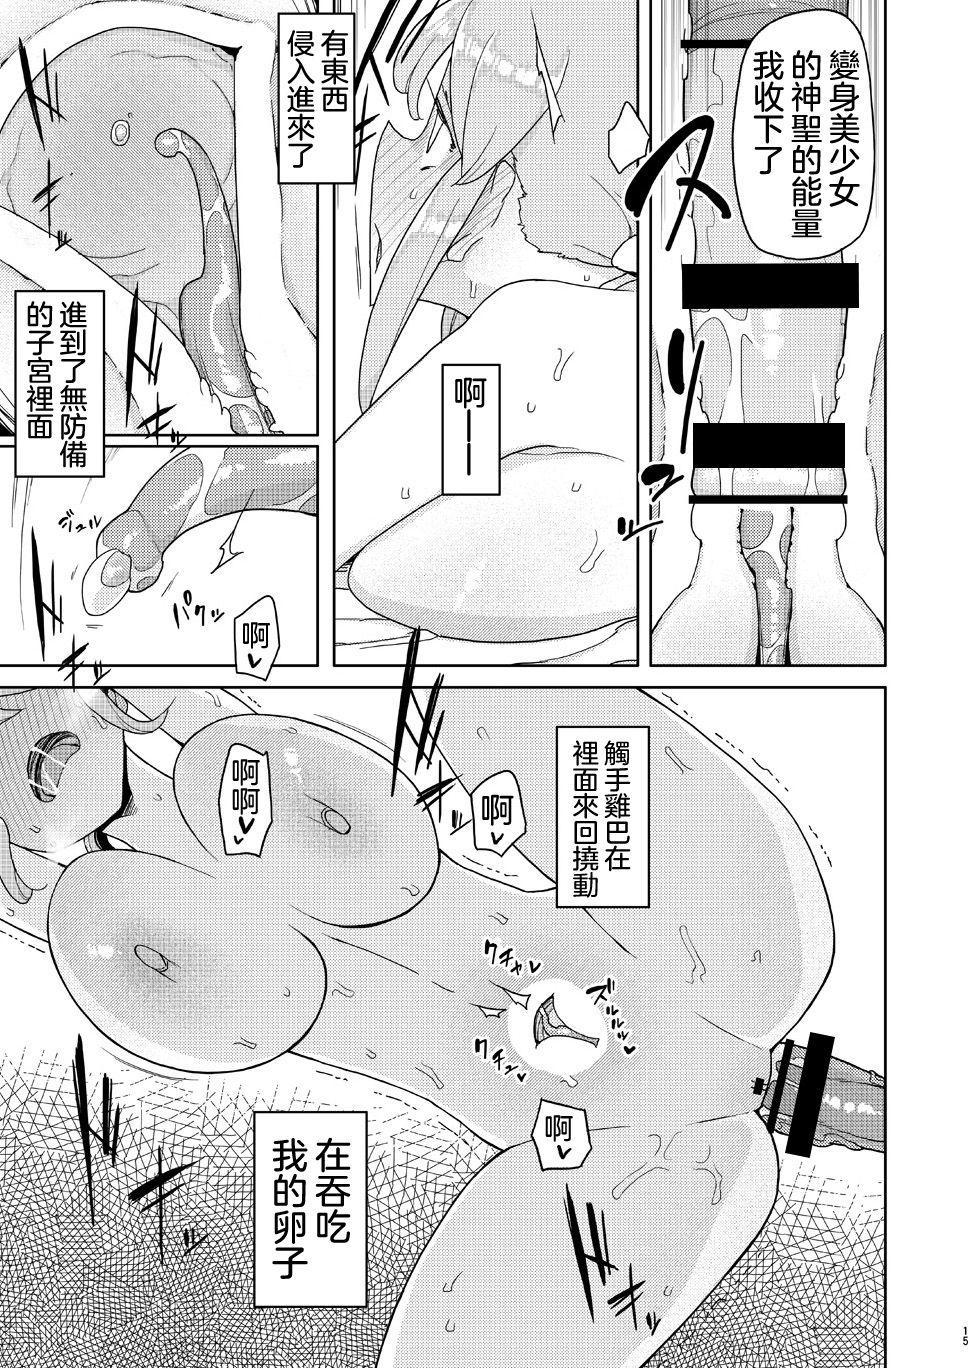 Ore ga Ijimeteta Onna ga Henshin Heroine ni Natta node 丨被我欺負過的女人竟然成為了變身美少女 14